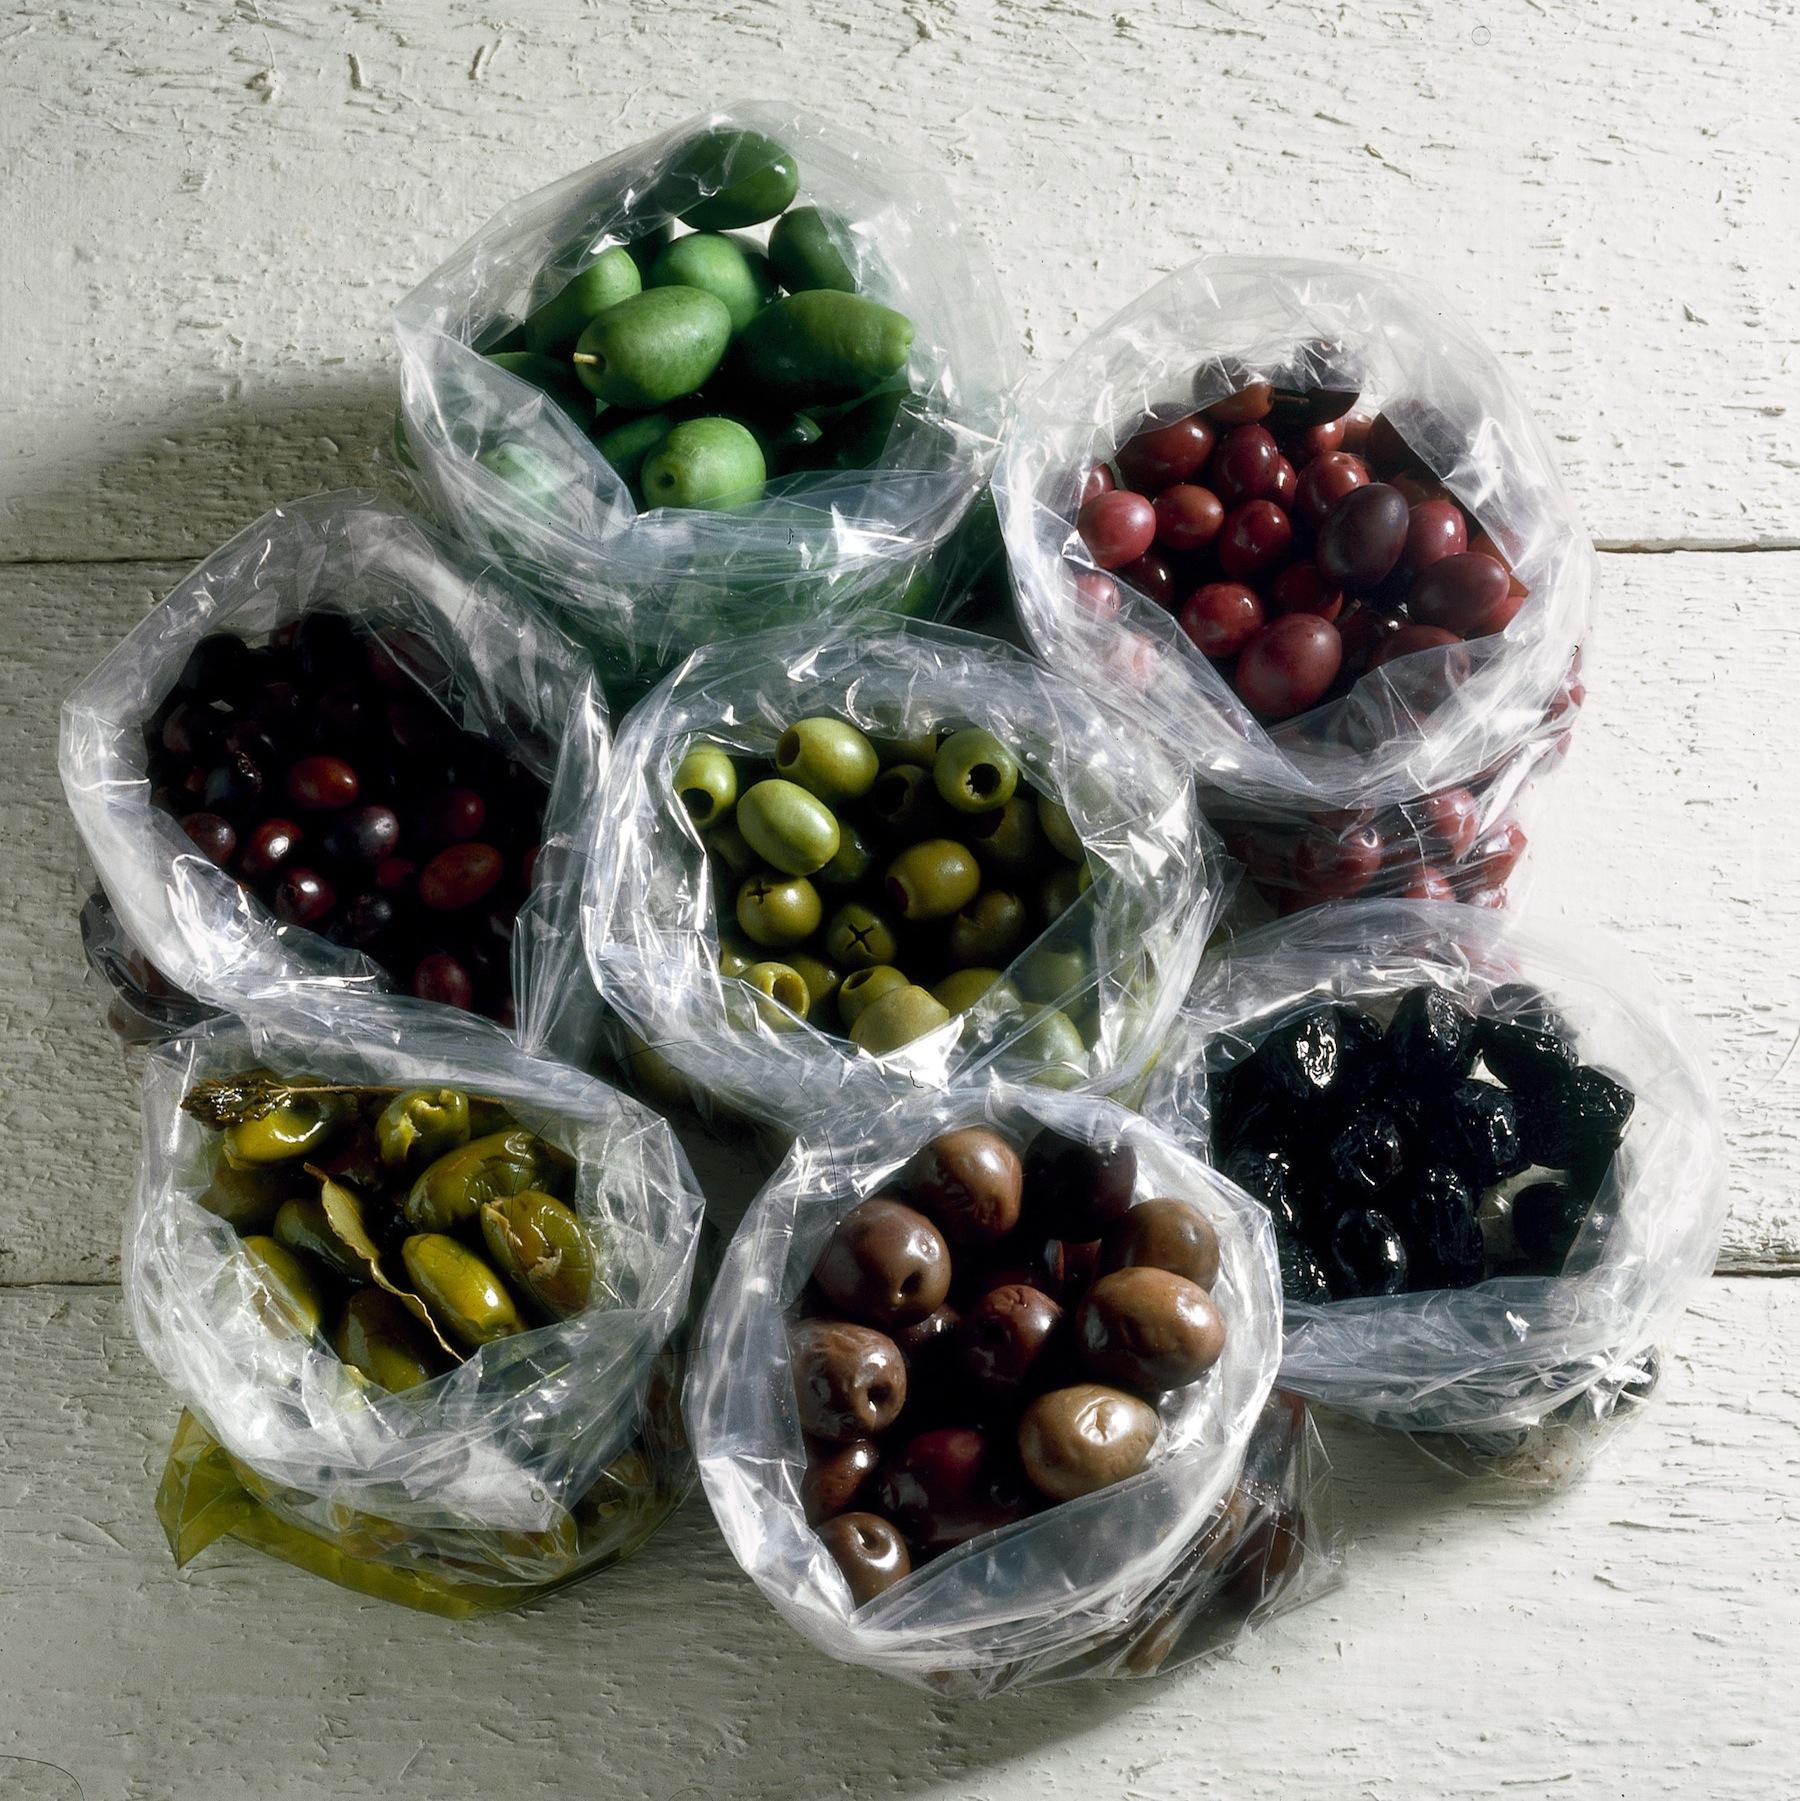 Olive da tavola conoscerle per sceglierle bene sale pepe - Tipi di olive da tavola ...